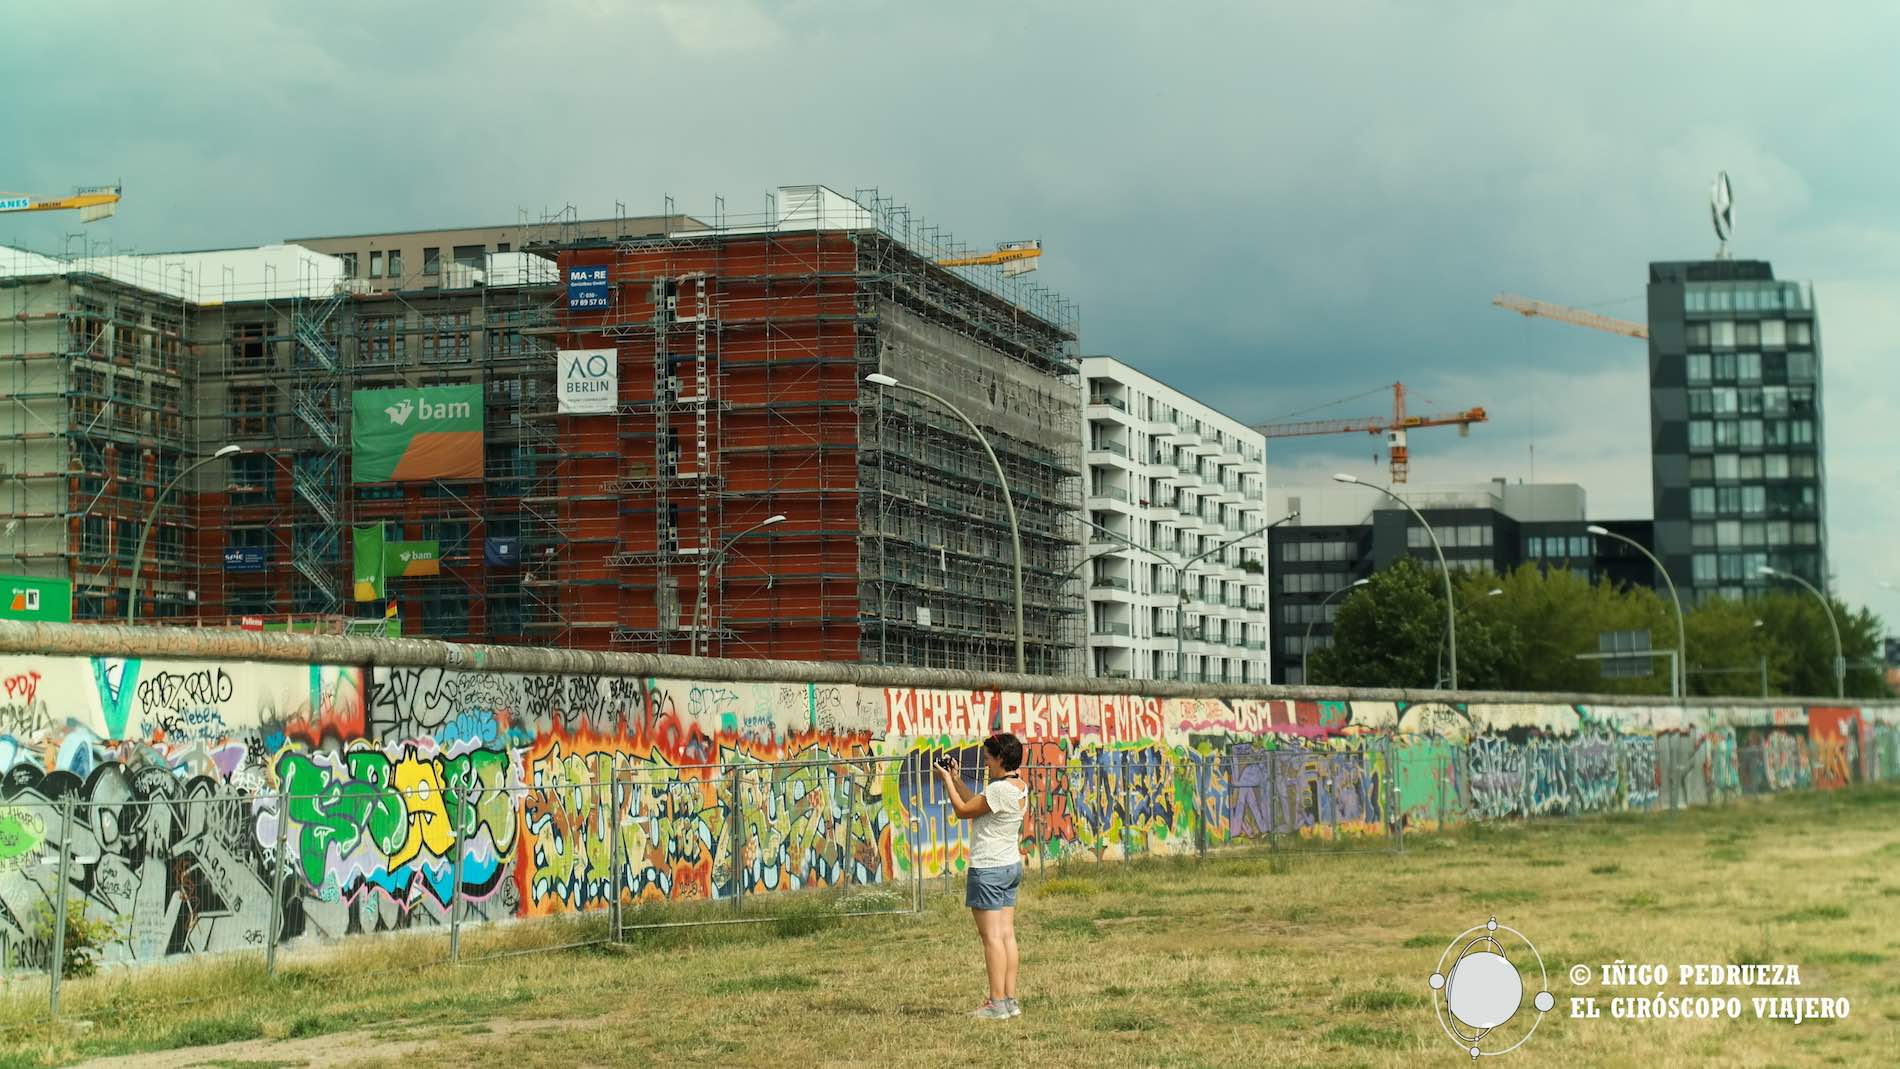 Muro de Berlin en la Mulherstrasse. ©Iñigo Pedrueza.